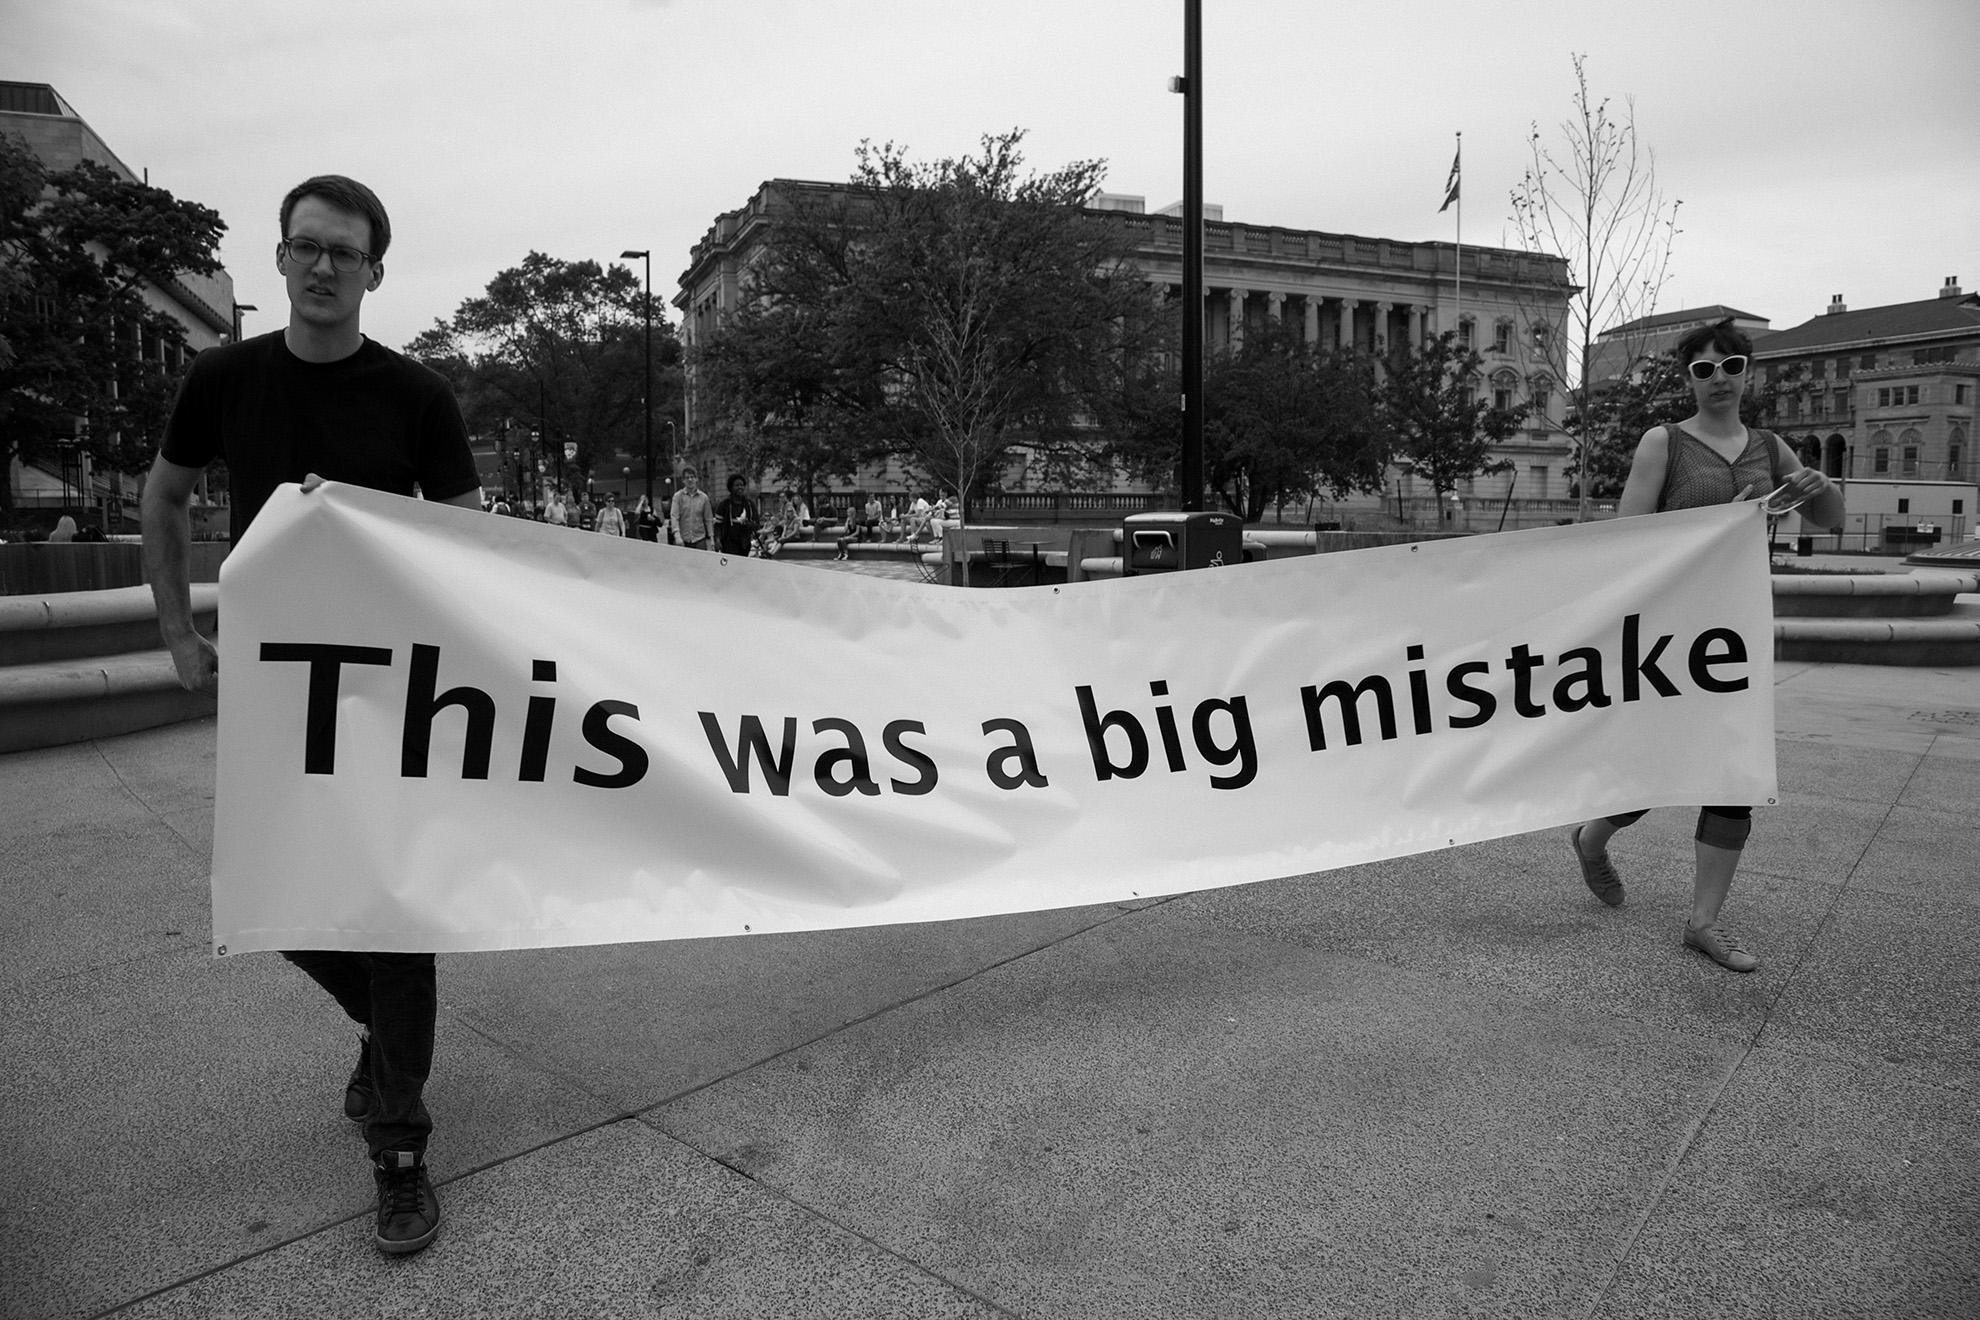 bigmistakeprotest-7.jpg